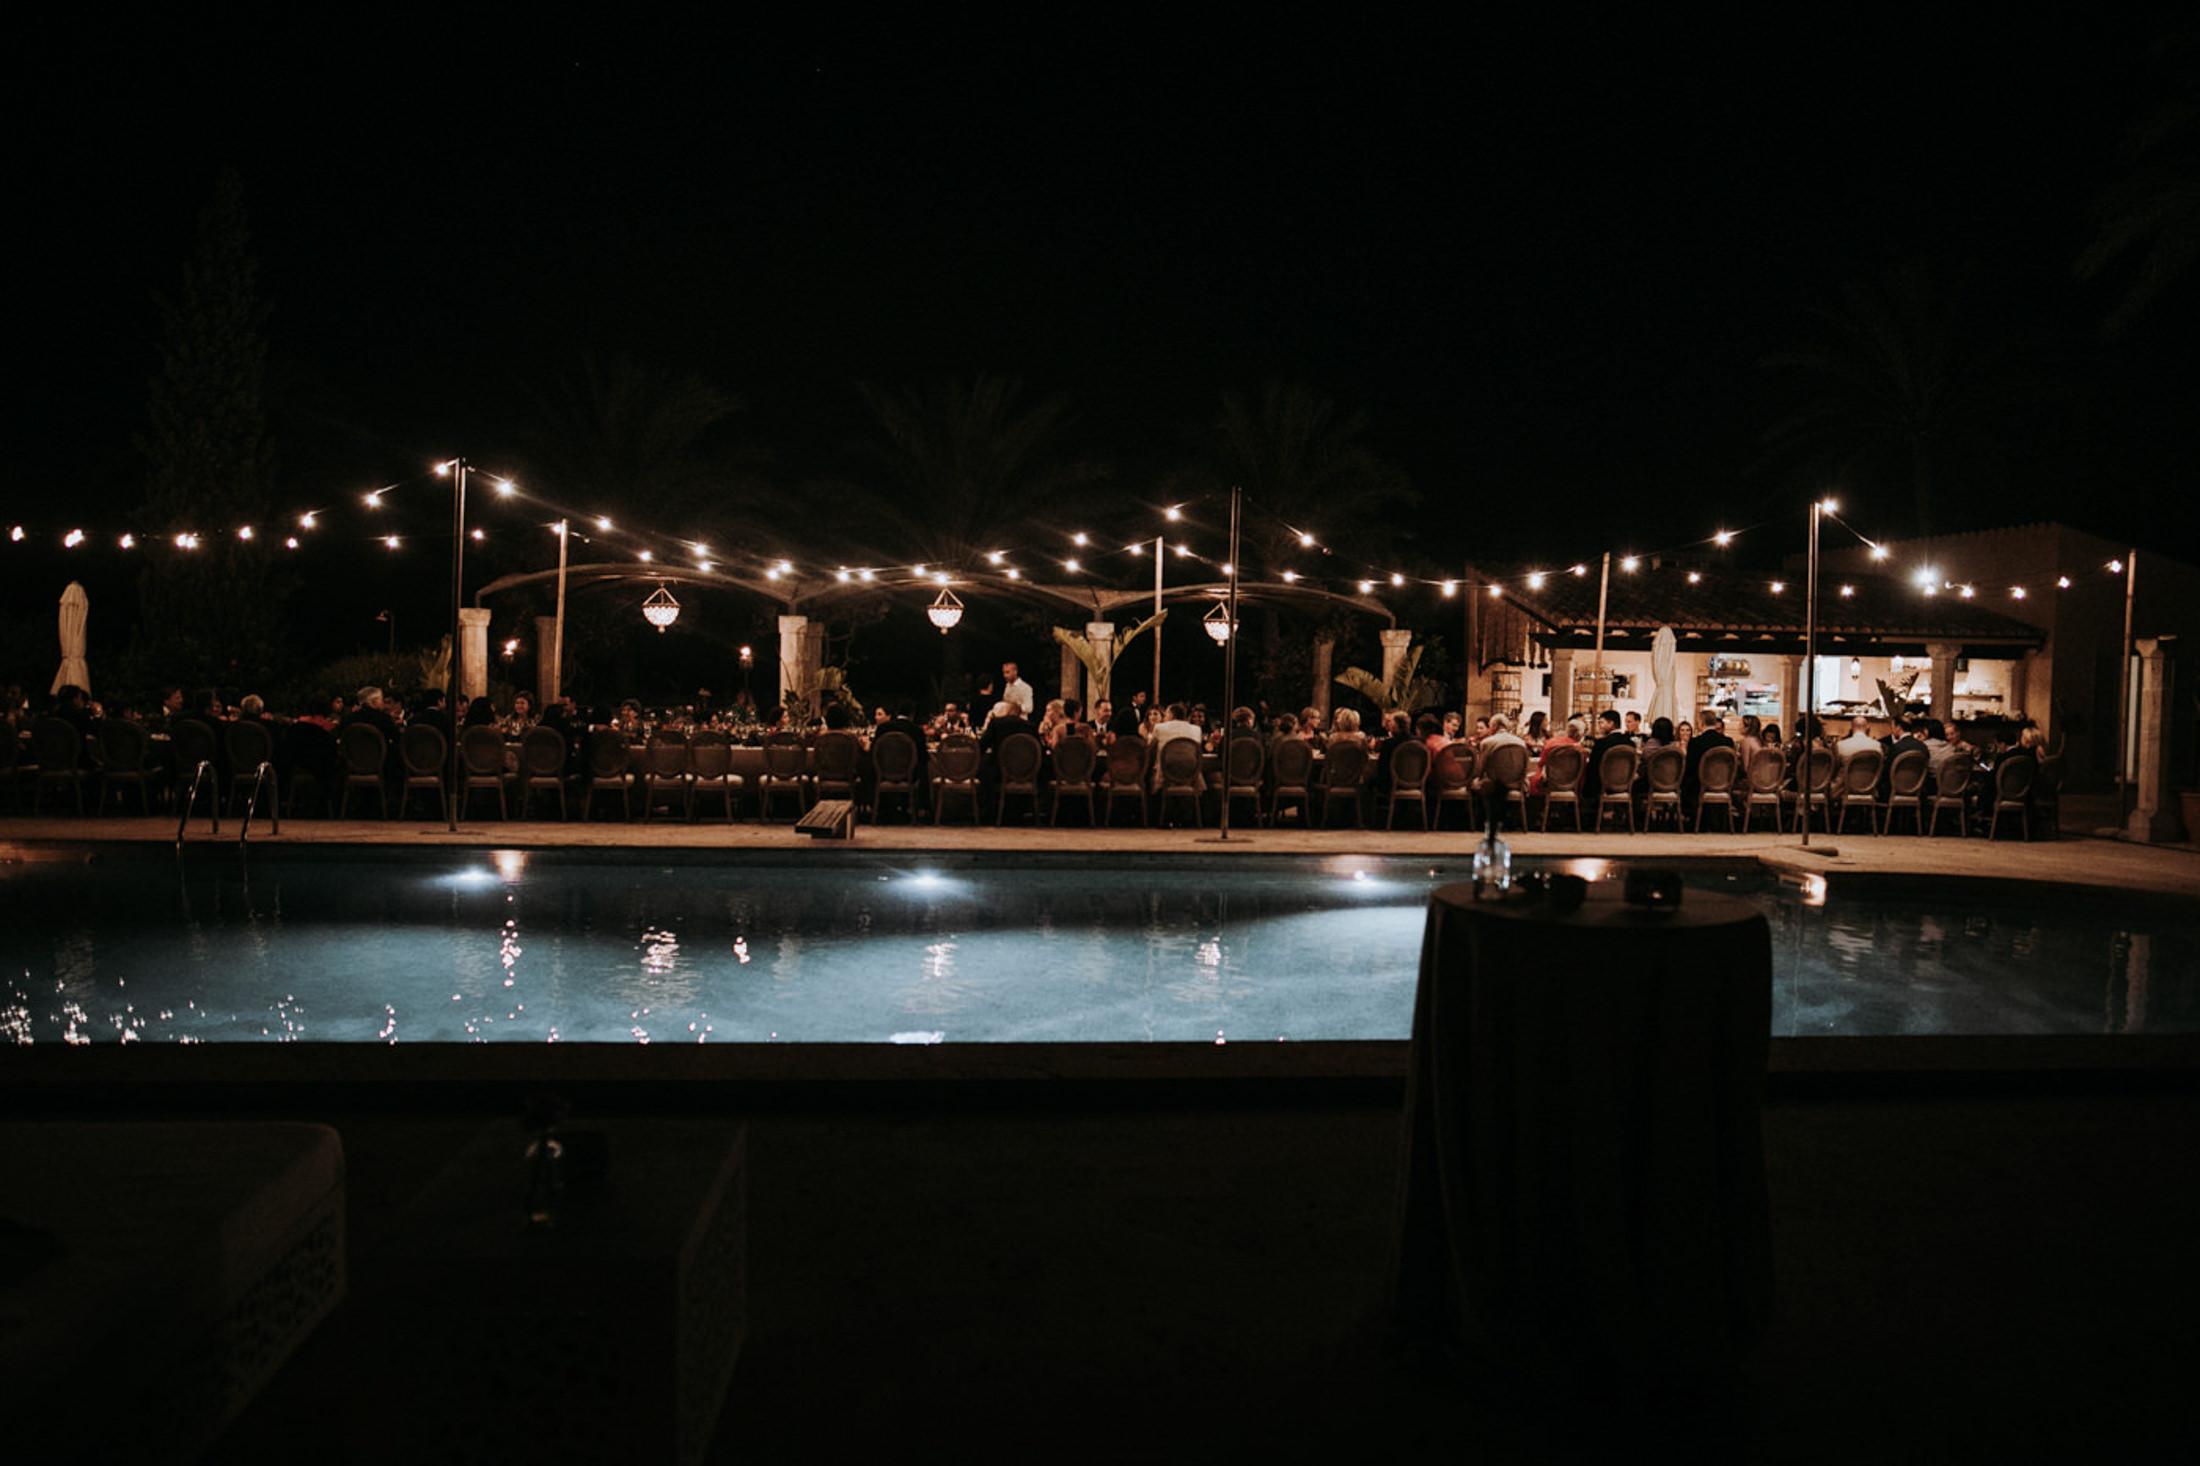 Wedding_Photographer_Mallorca_Daniela-Marquardt_Photography_New_York_Iceland_Tuscany_Santorini_Portugal_Austria_Bavaria_Elopement_Hochzeitsfotograf_AntjeRajat2_114